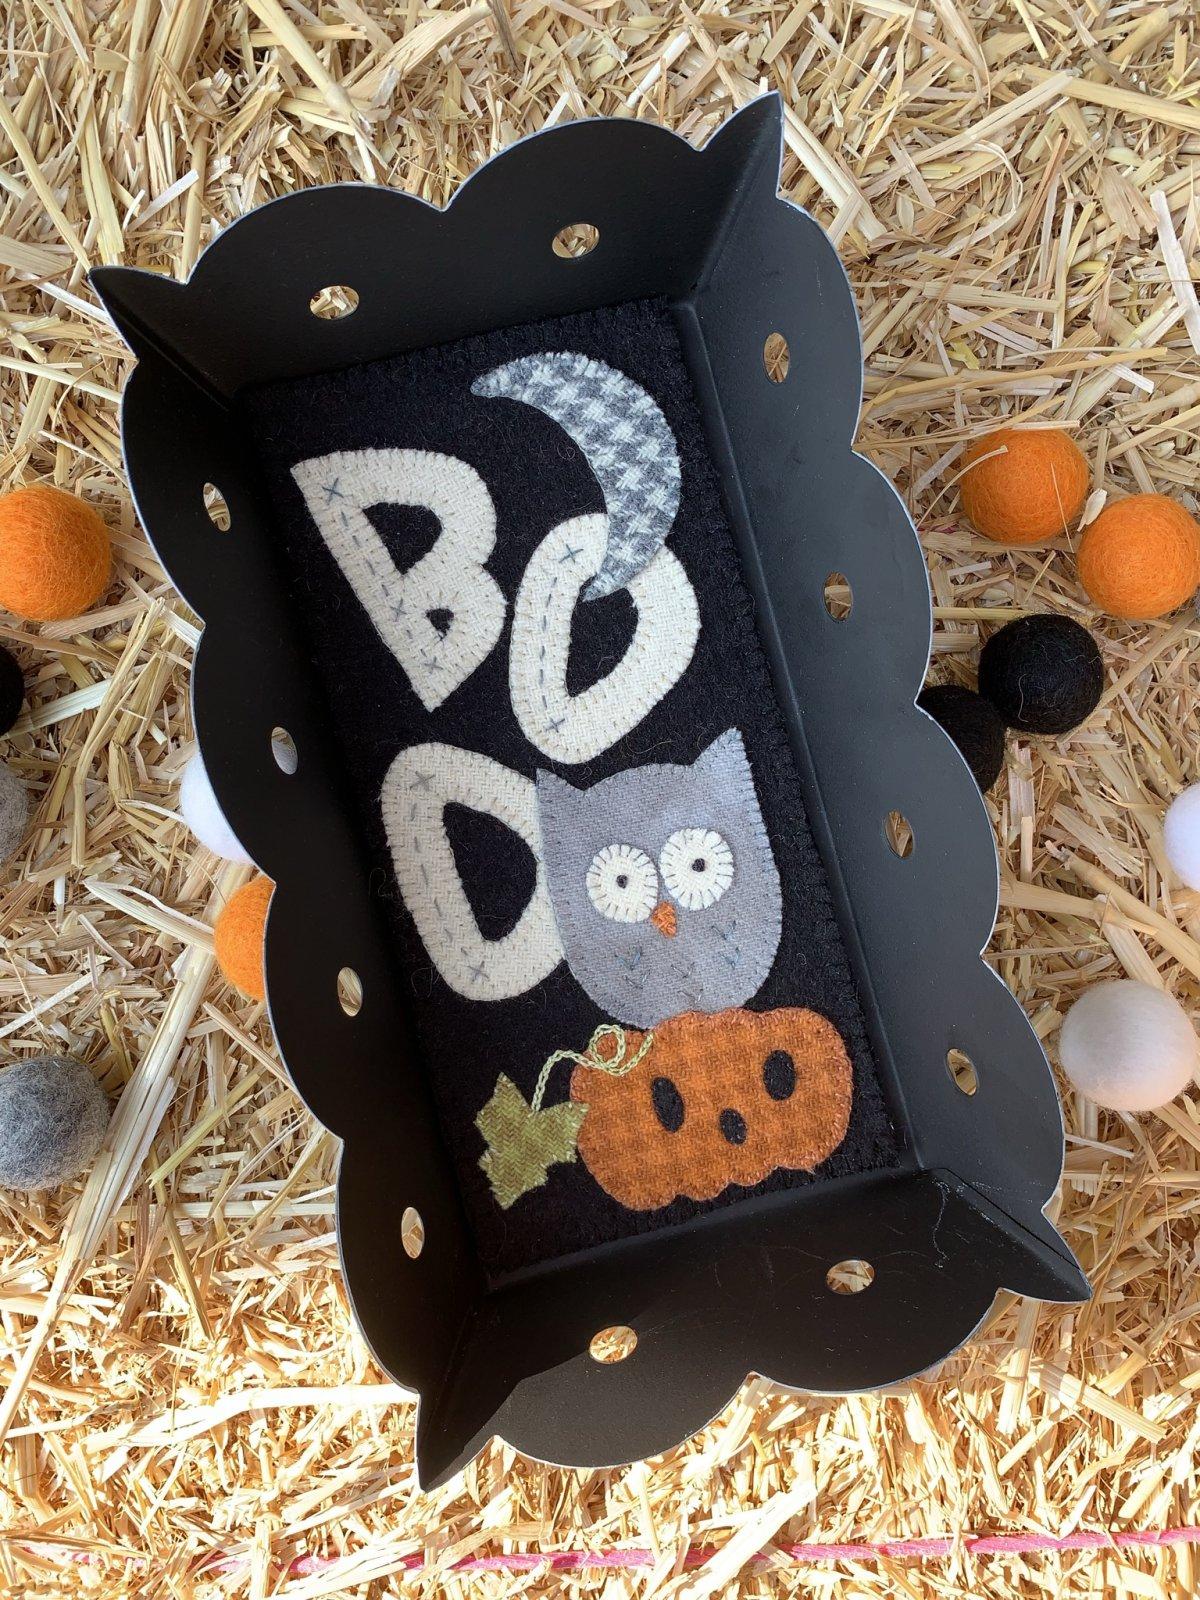 Boo Whoo! wool applique Digital PDF pattern   Sandra Workman/Pine Mountain Designs